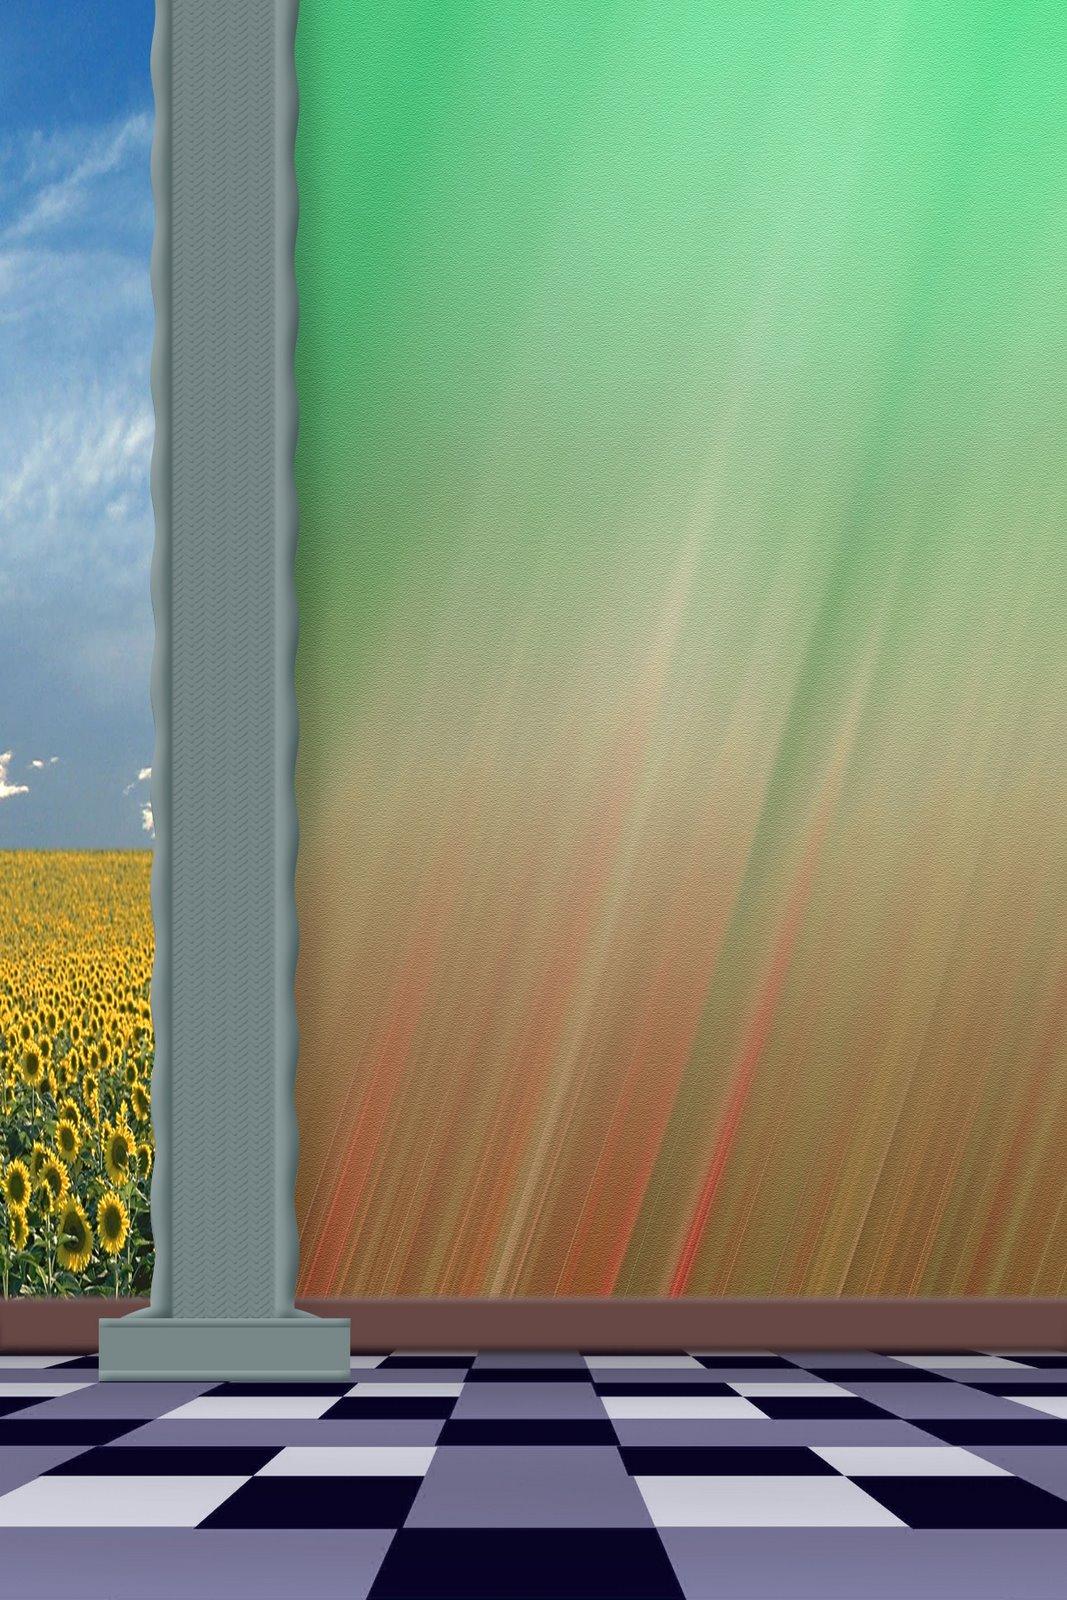 Studio Photoshop Backgrounds Free